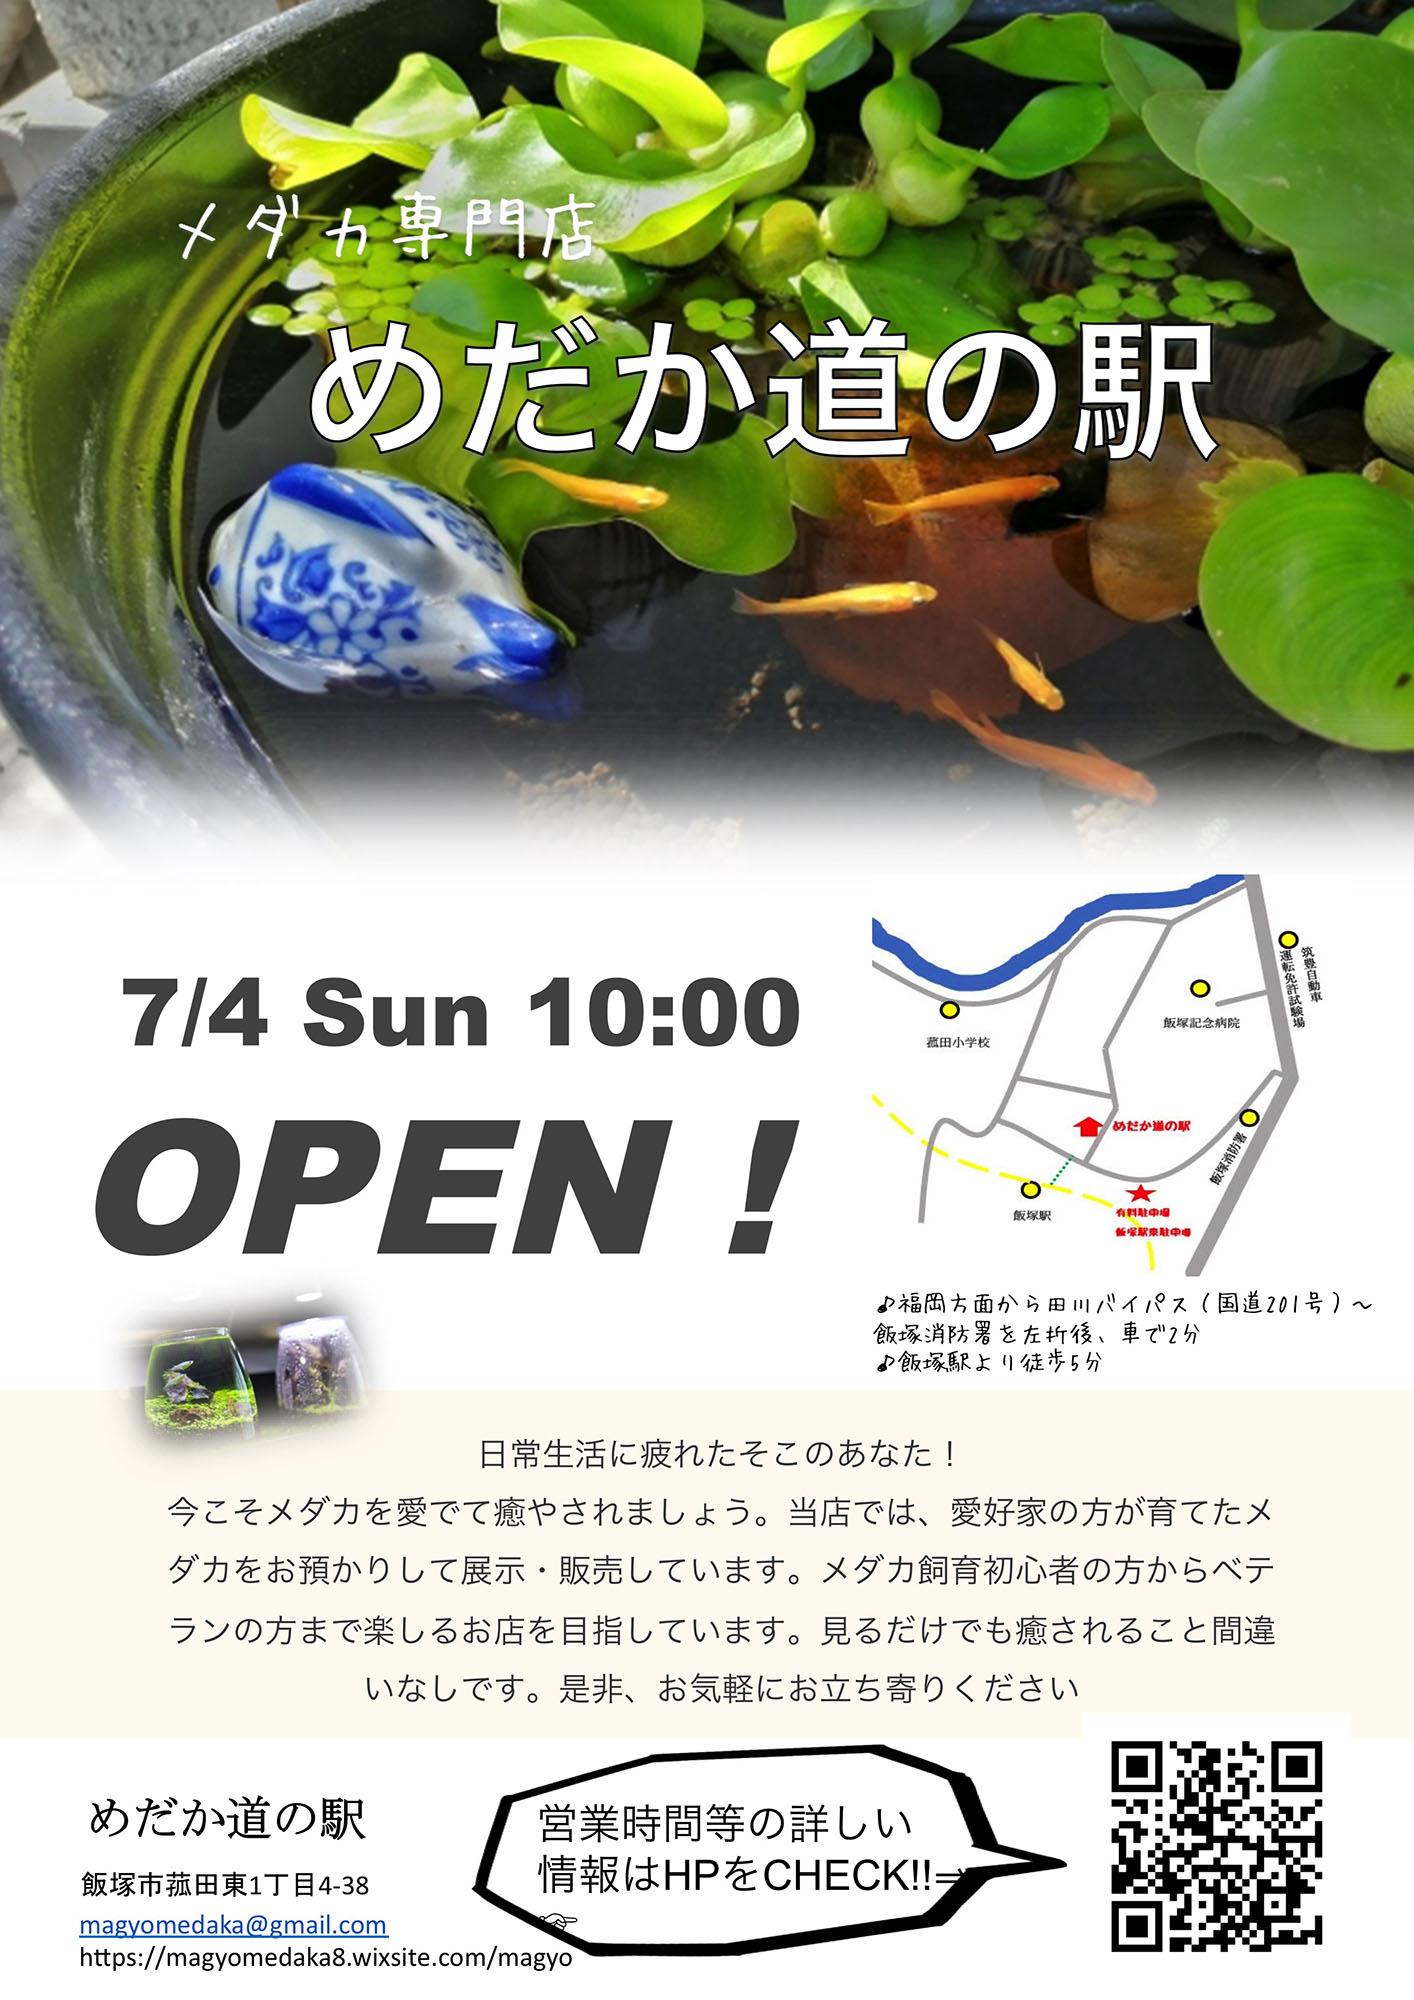 "<span class=""title"">【Magyo Medaka Farm】めだか道の駅オープンのお知らせ</span>"